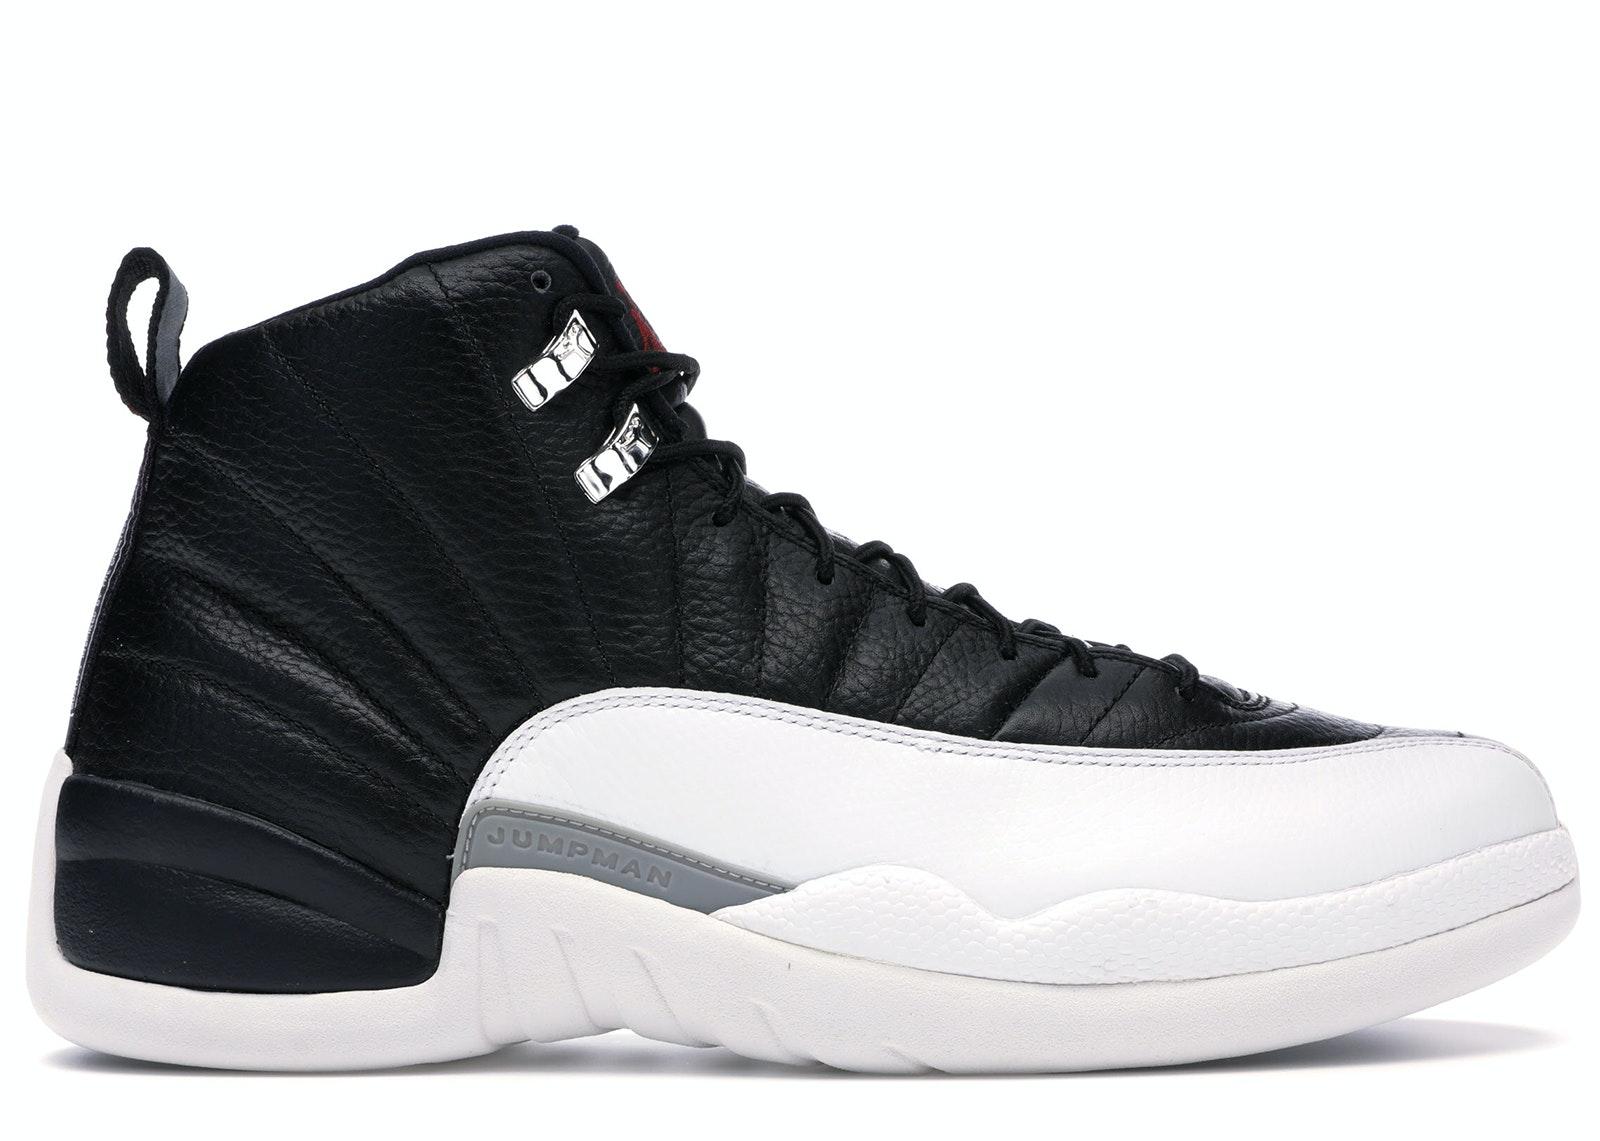 Jordan 12 Retro Playoffs (2012)